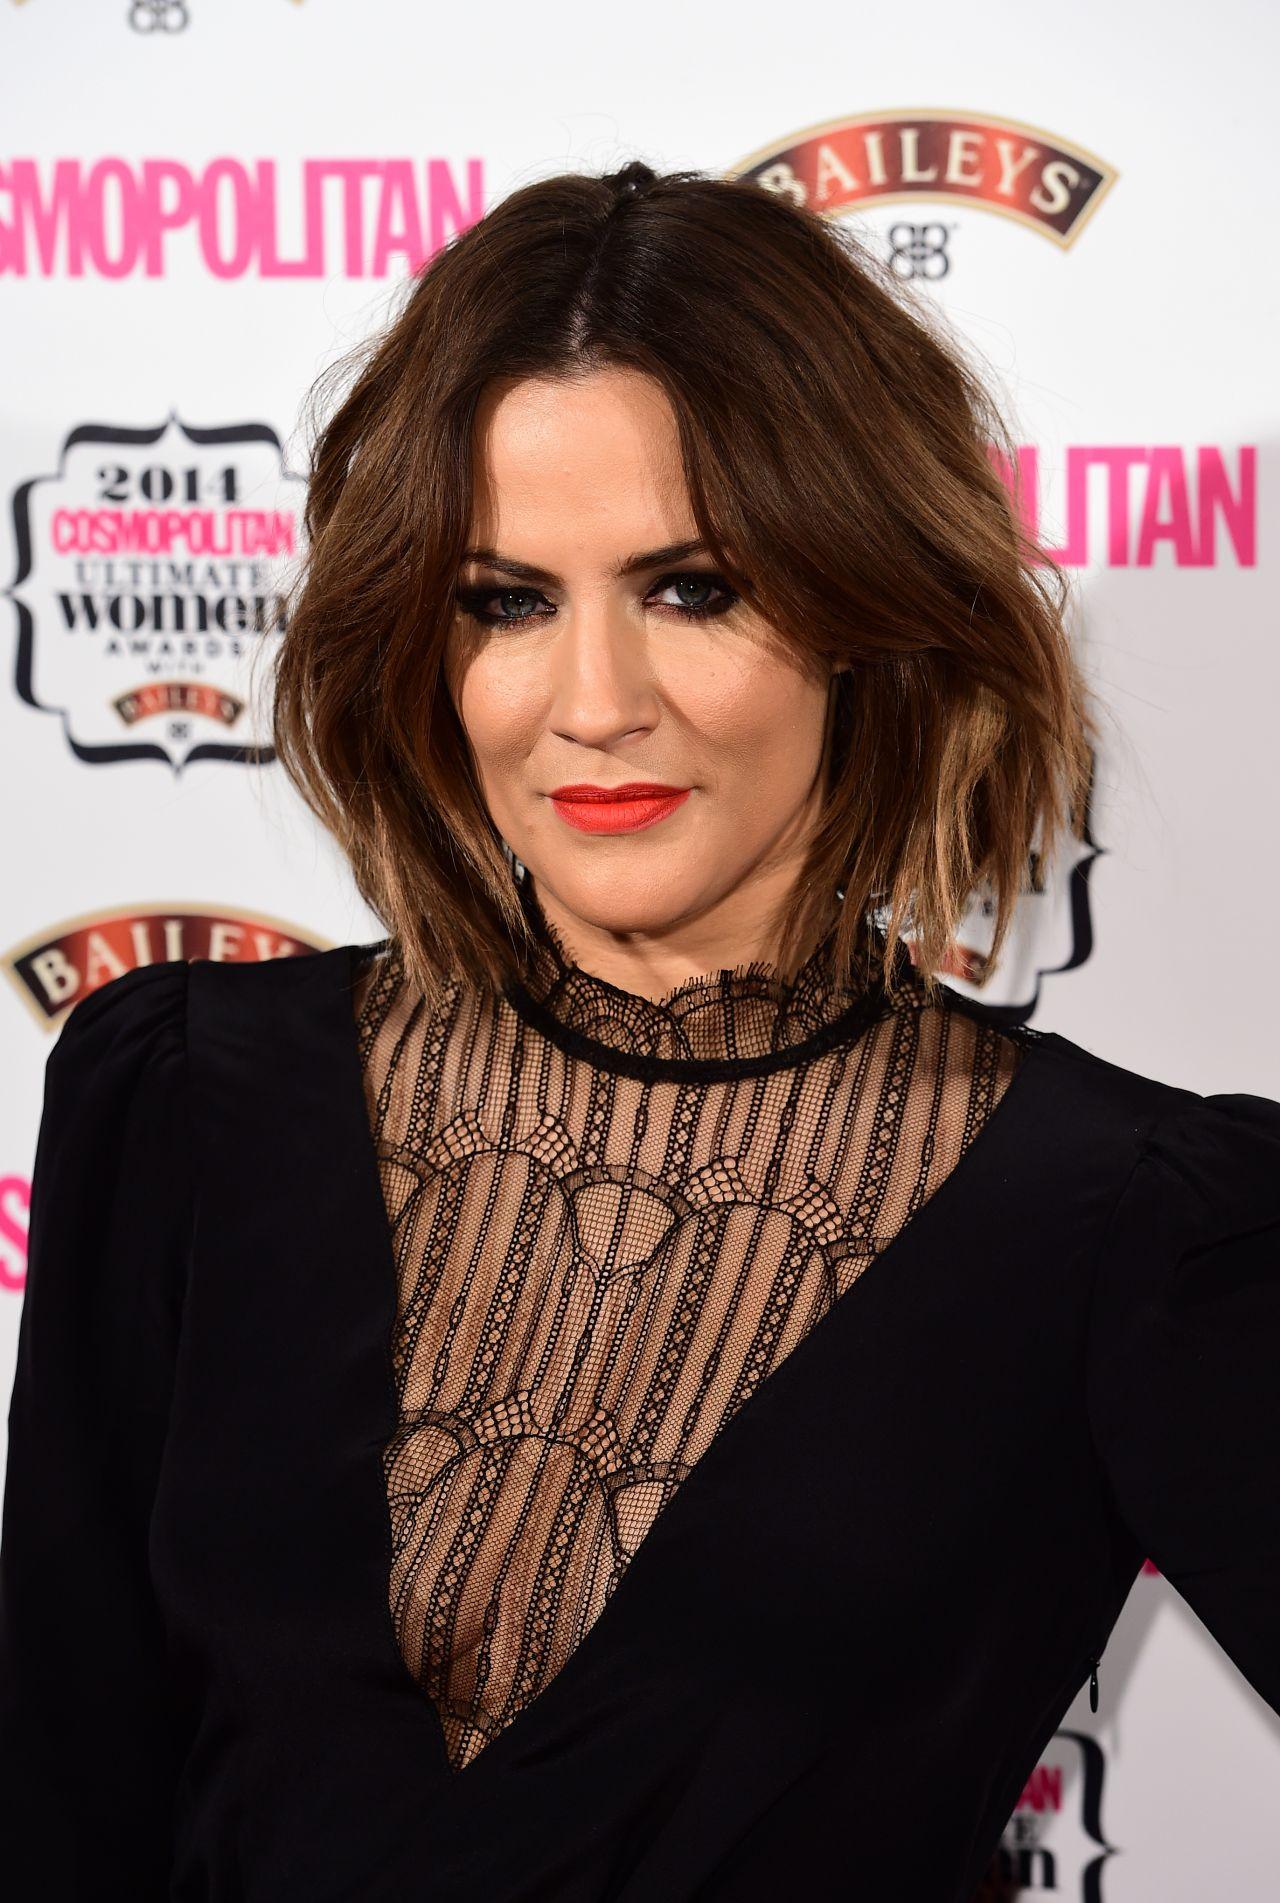 Caroline Flack 2014 Cosmopolitan Ultimate Women Awards